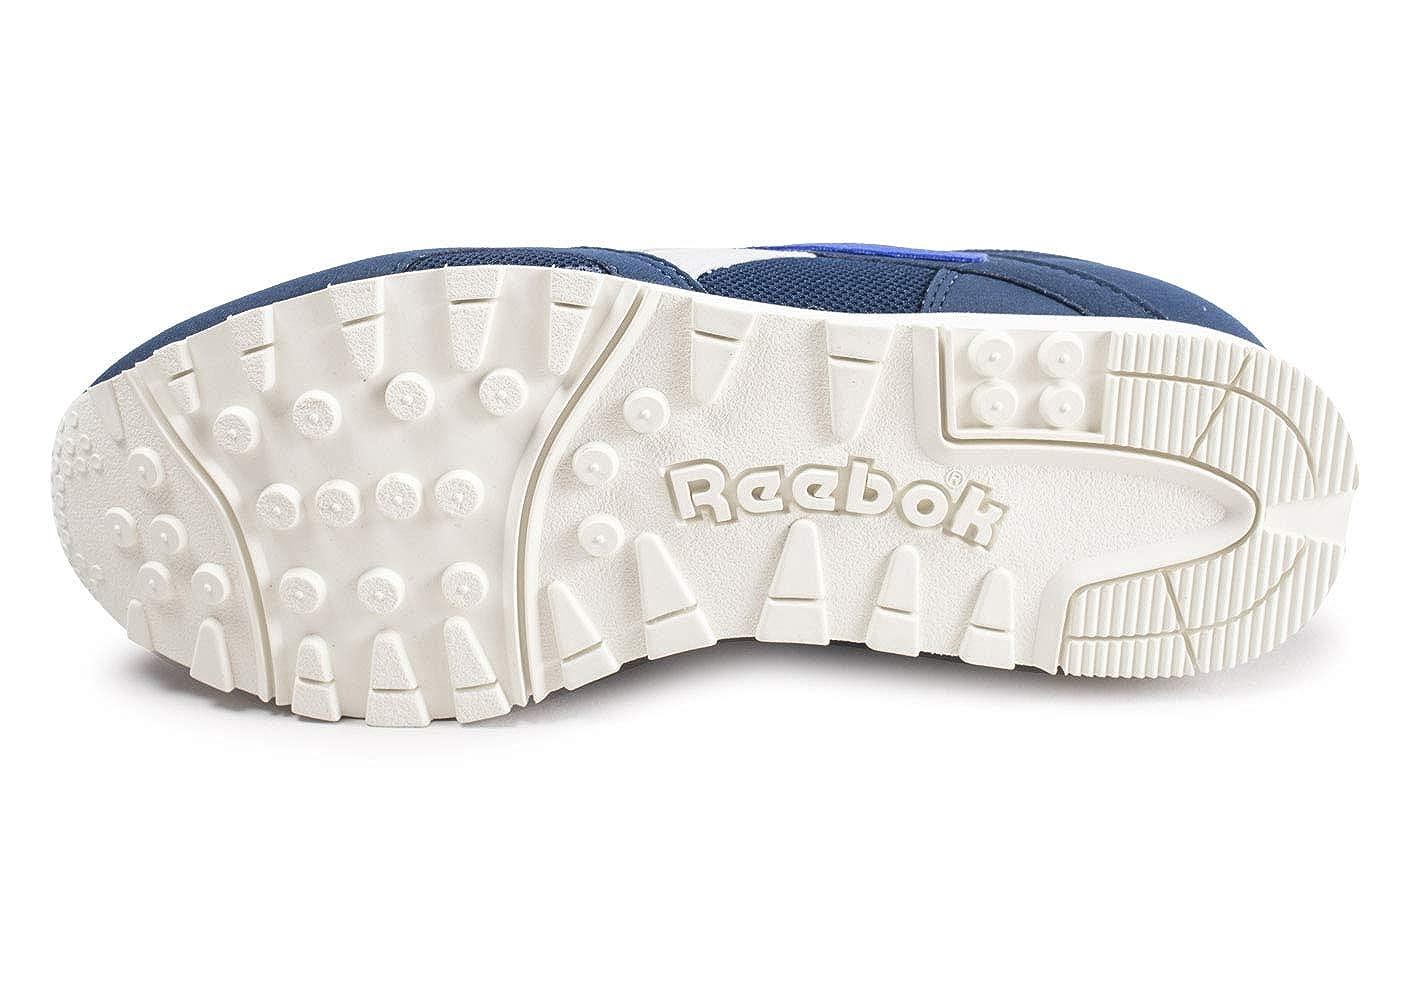 Reebok Rapide Mu, Scarpe da Fitness Uomo   Exquisite Exquisite Exquisite (medio) lavorazione    Scolaro/Ragazze Scarpa  05e136